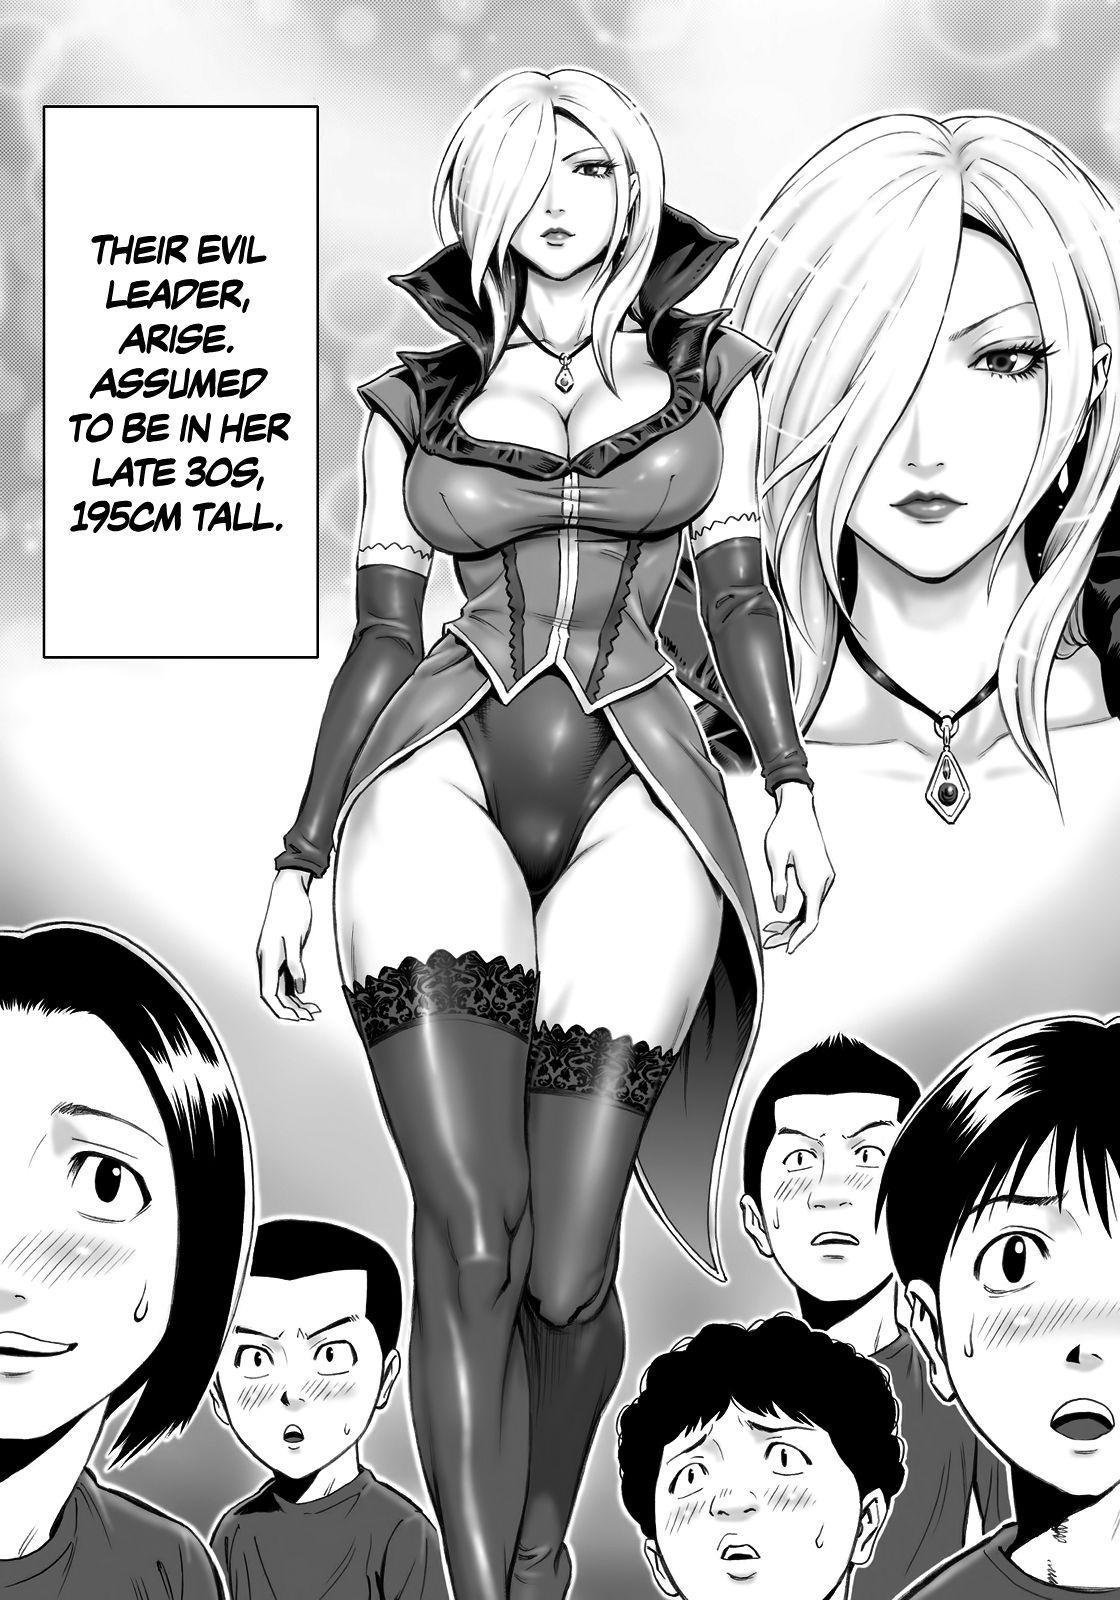 Aku no Onna Shuryou to Doutei Kouseiin | Evil Leader and the Virgin Members 2